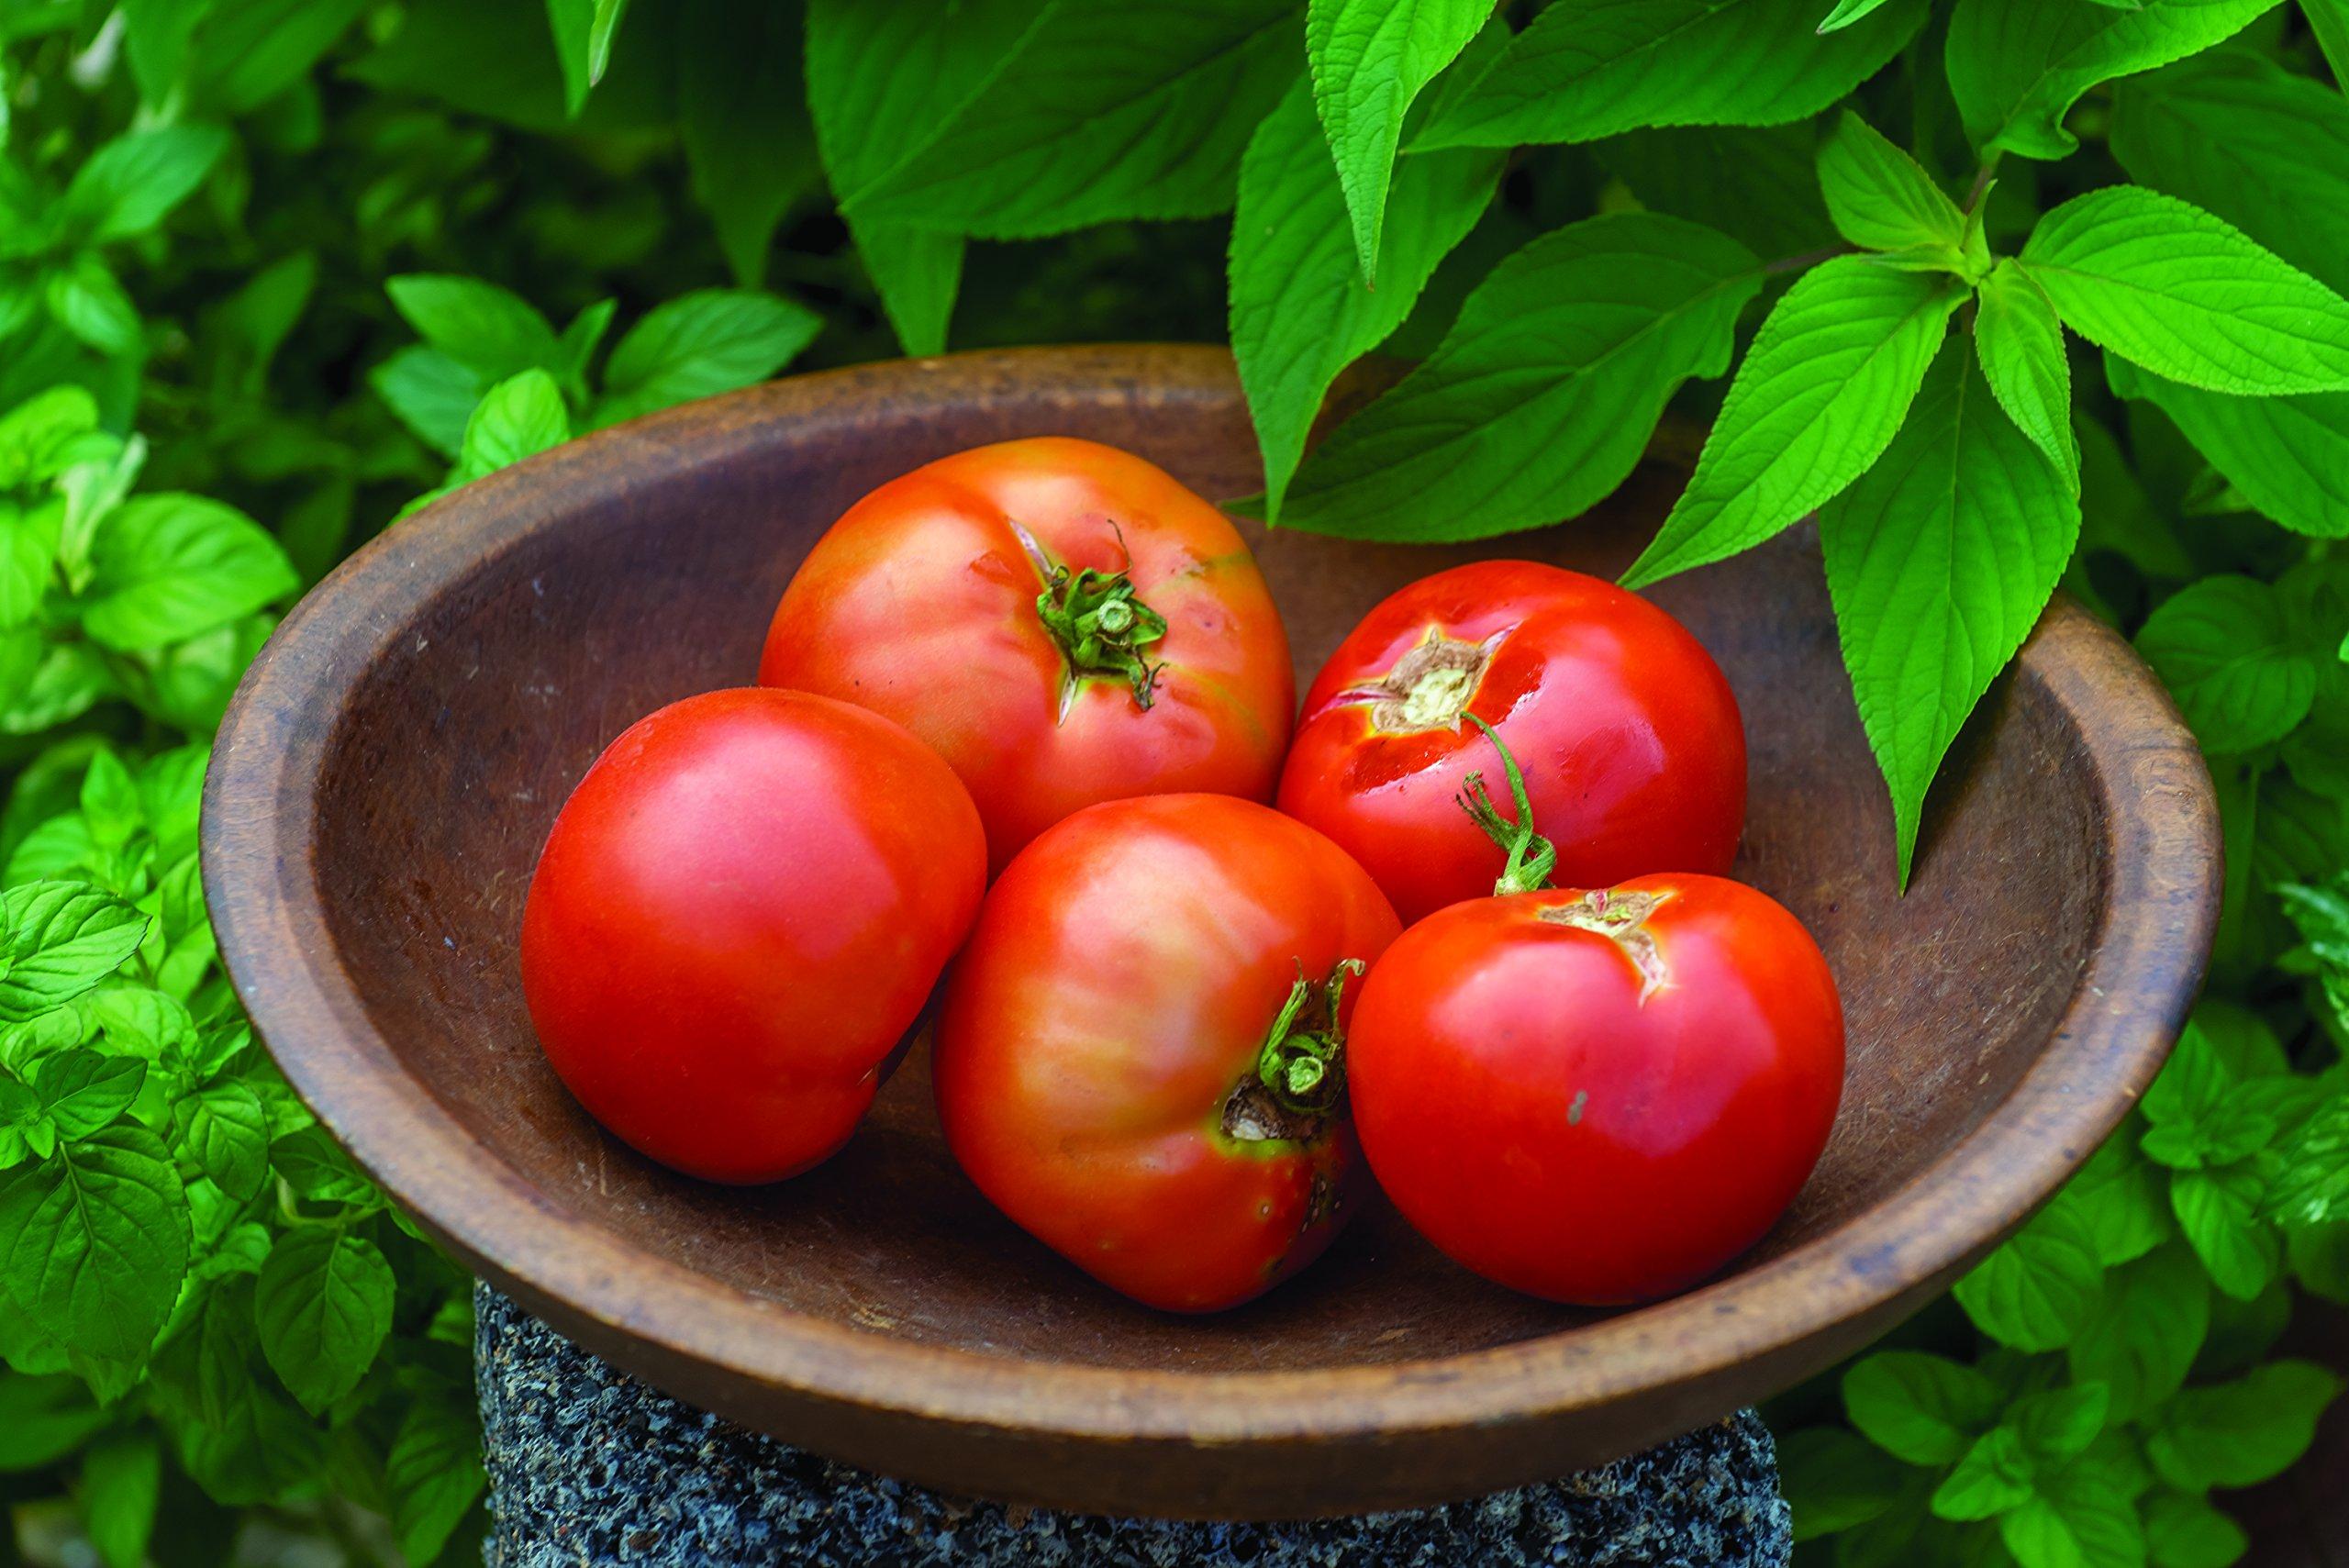 Burpee's 'Big Boy' Tomato Plants, 3 plants